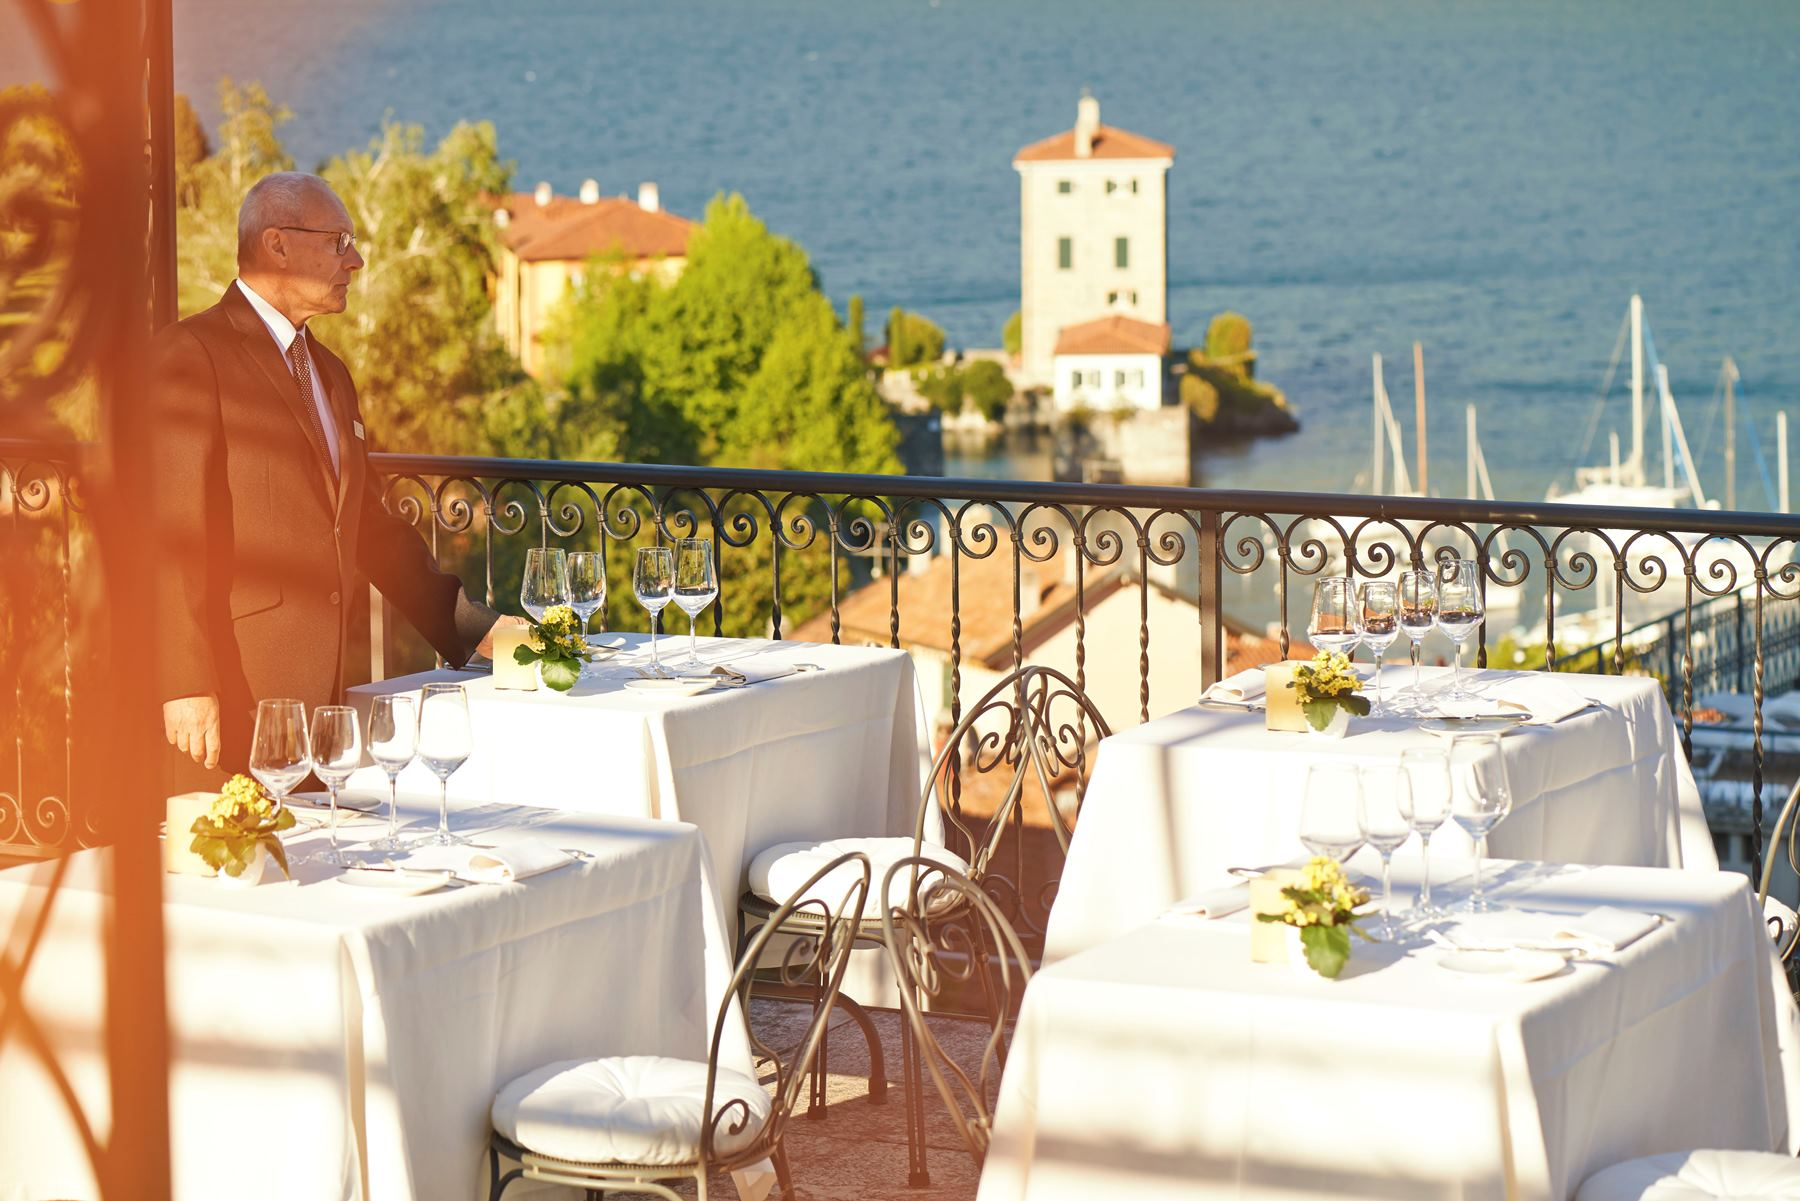 Belvedere Bellagio Official Site Hotel Bellagio Italy Hotel